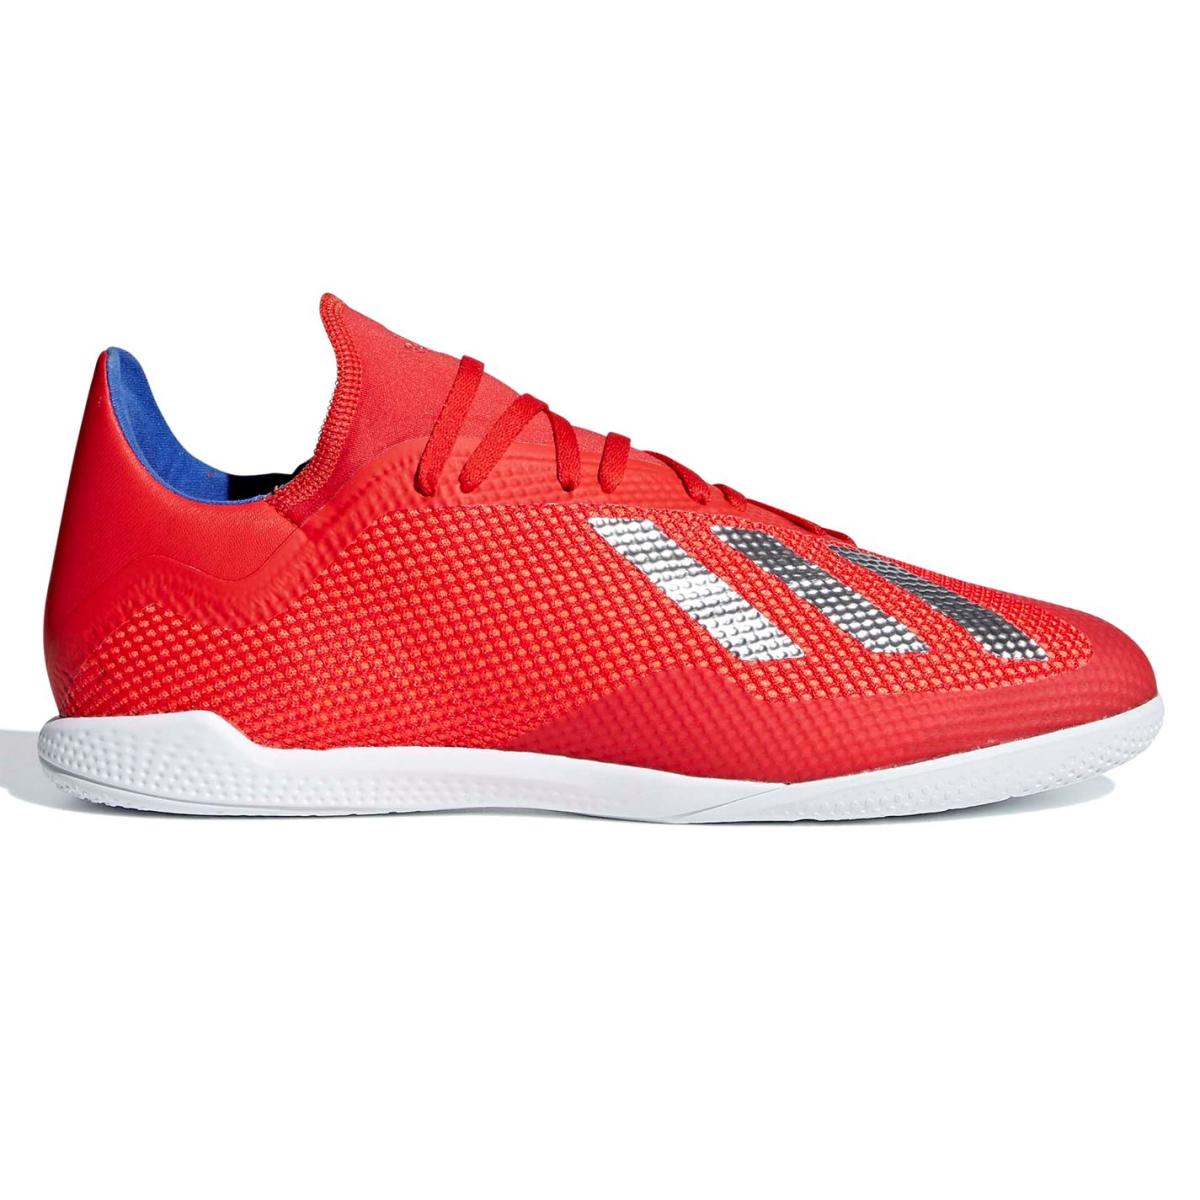 adidas X Tango 18.3 Herren Indoor Fußballschuhe Rot_Silver_Blau